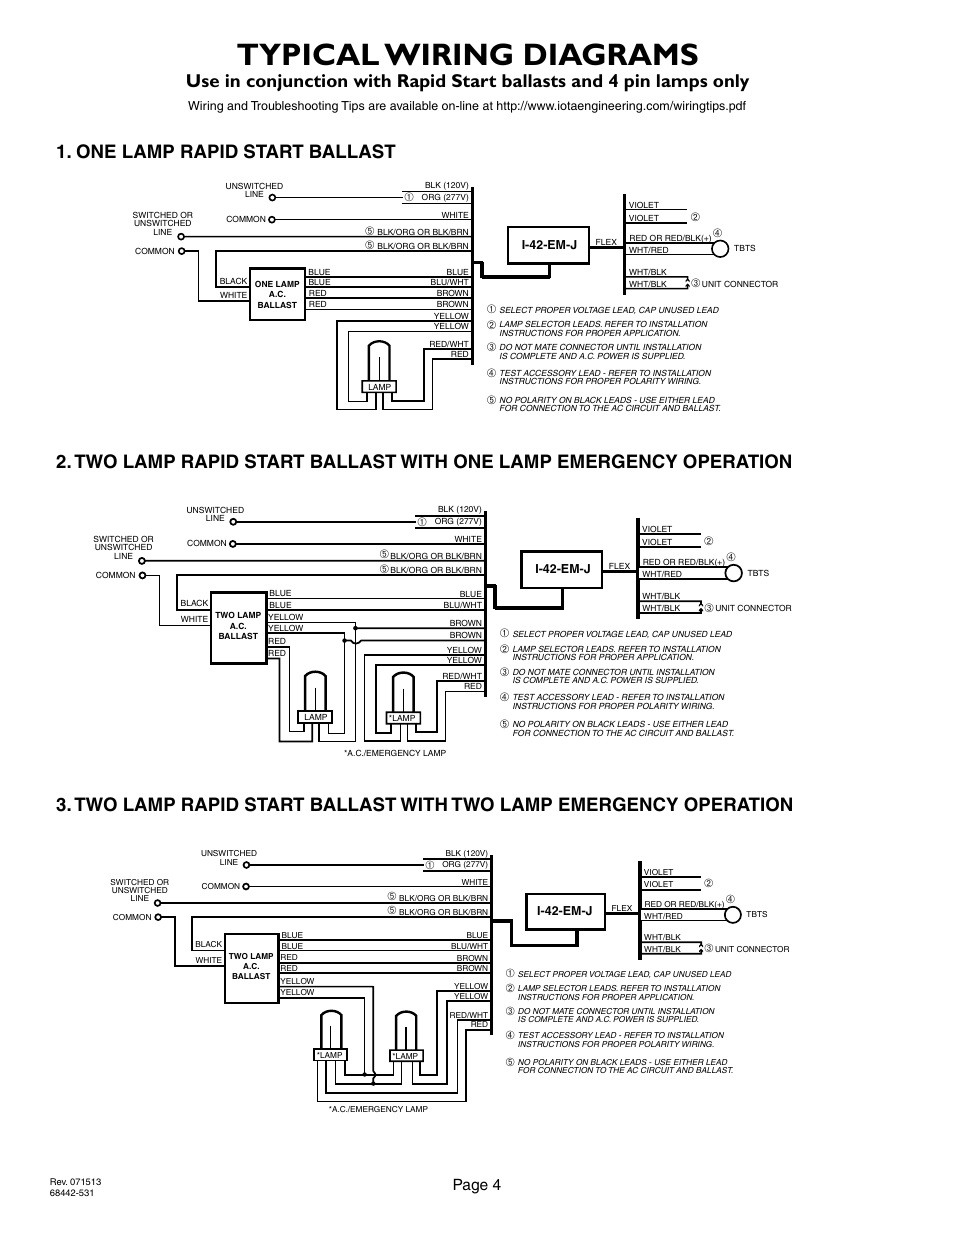 iota i 42 em j page4?resize\=665%2C861 iota i320 emergency ballast wiring diagram 277 lighting wiring iota isl 540 wiring diagram at eliteediting.co